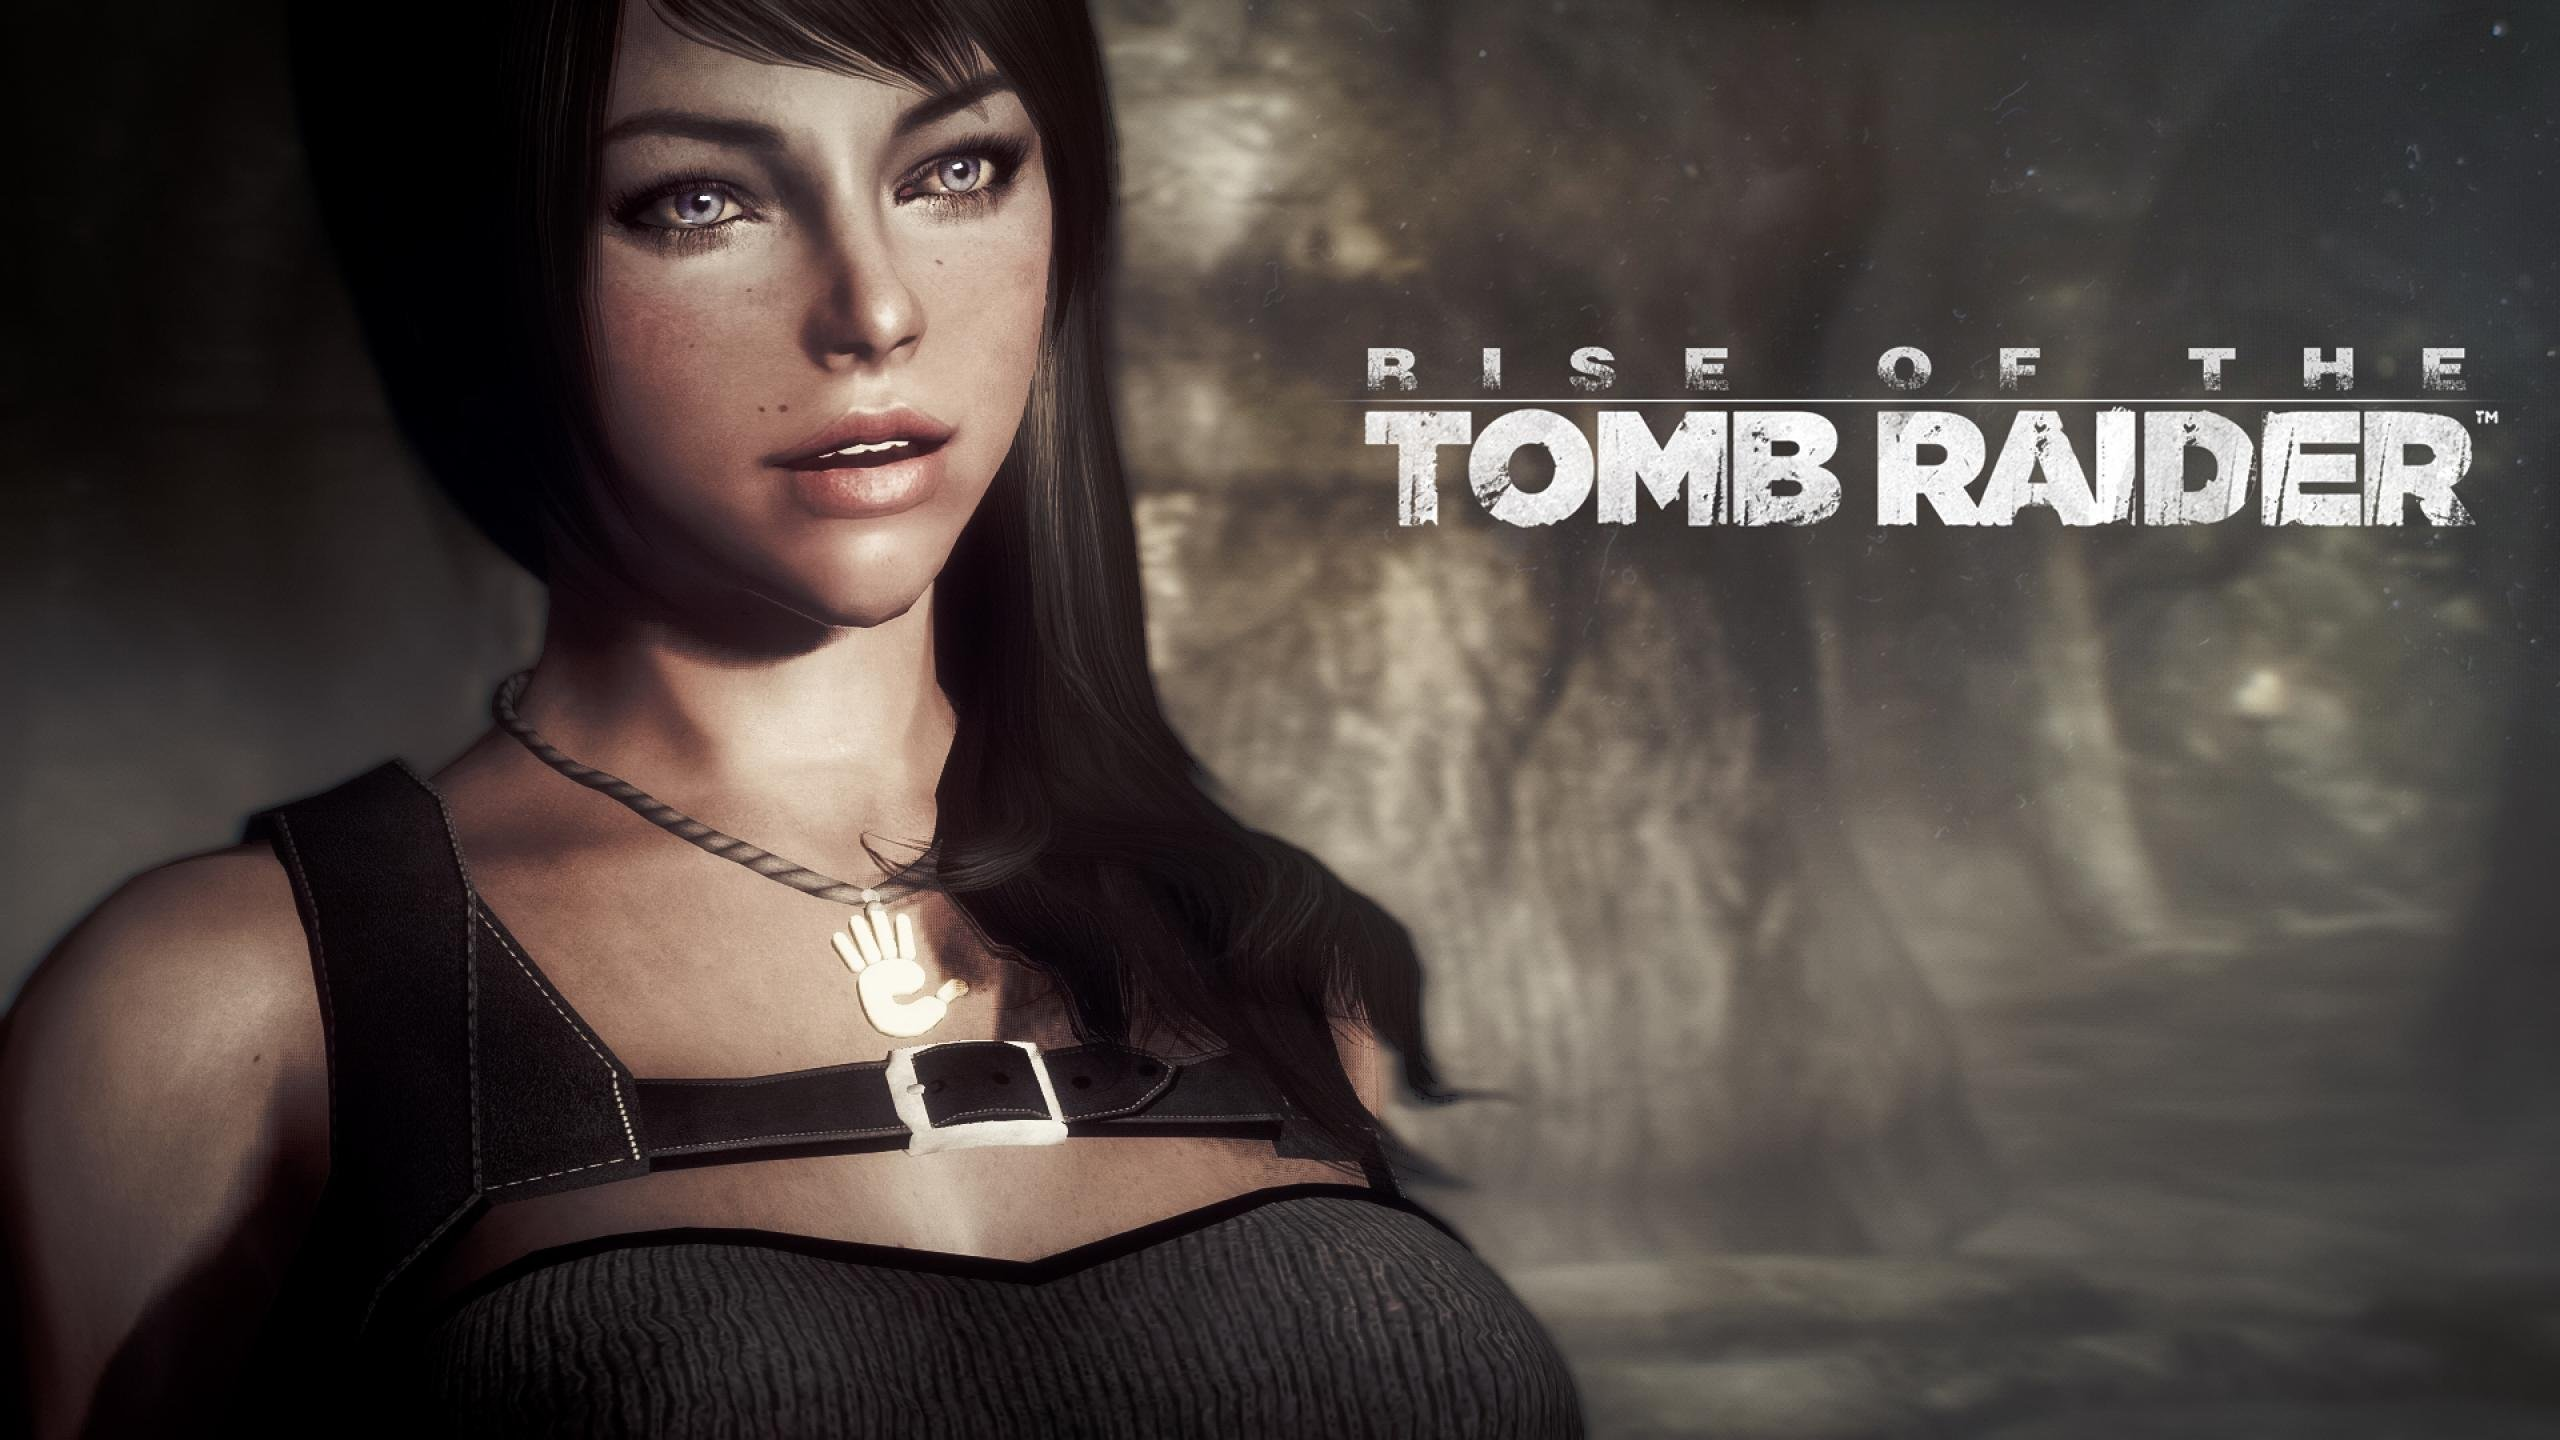 RISE TOMB RAIDER Lara Croft Action Adventure Fantasy Warrior Poster Wallpaper